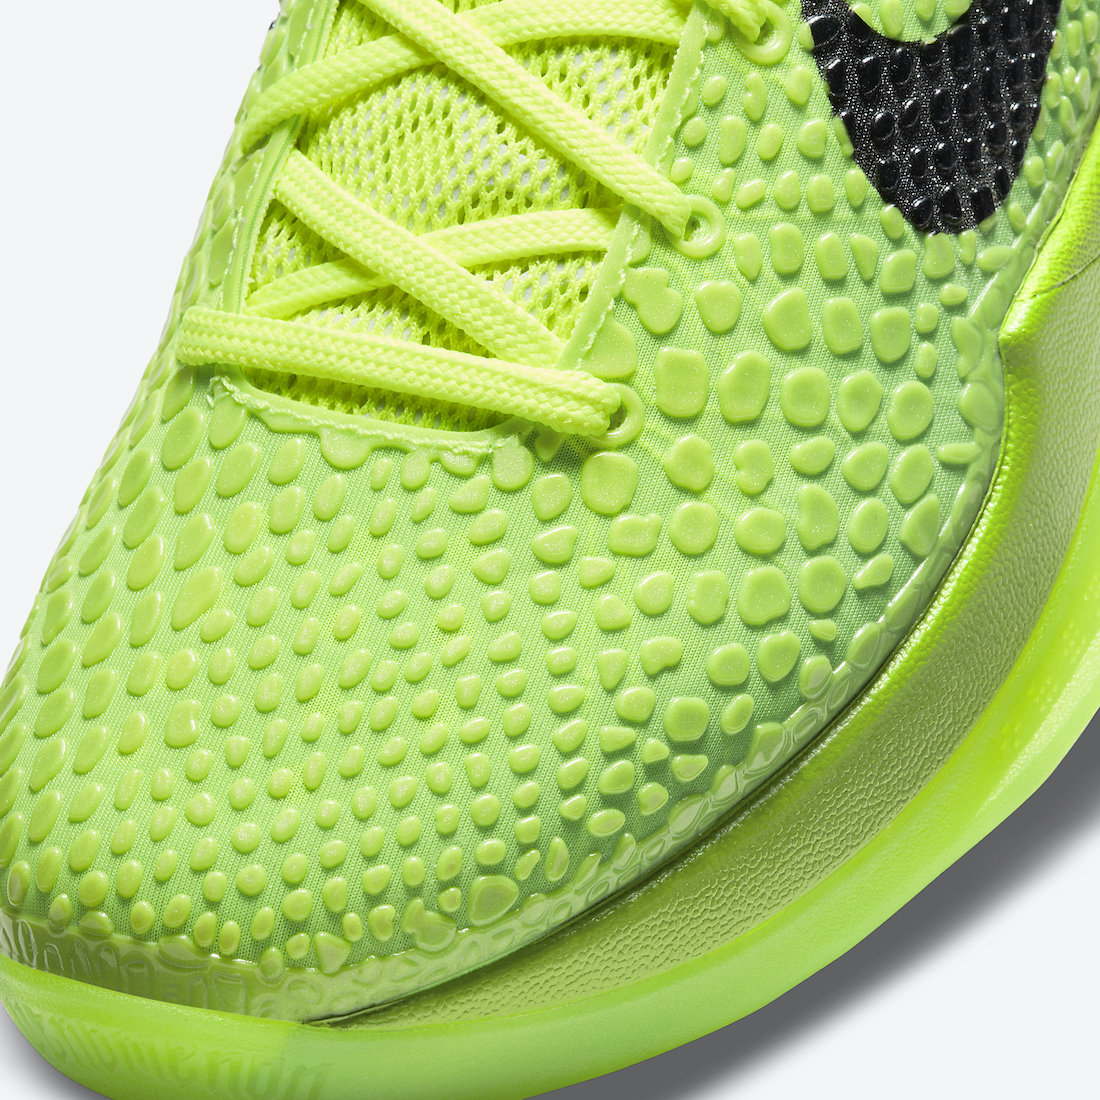 Nike-Kobe-6-Protro-Grinch-CW2190-300-Release-Date-Price-6